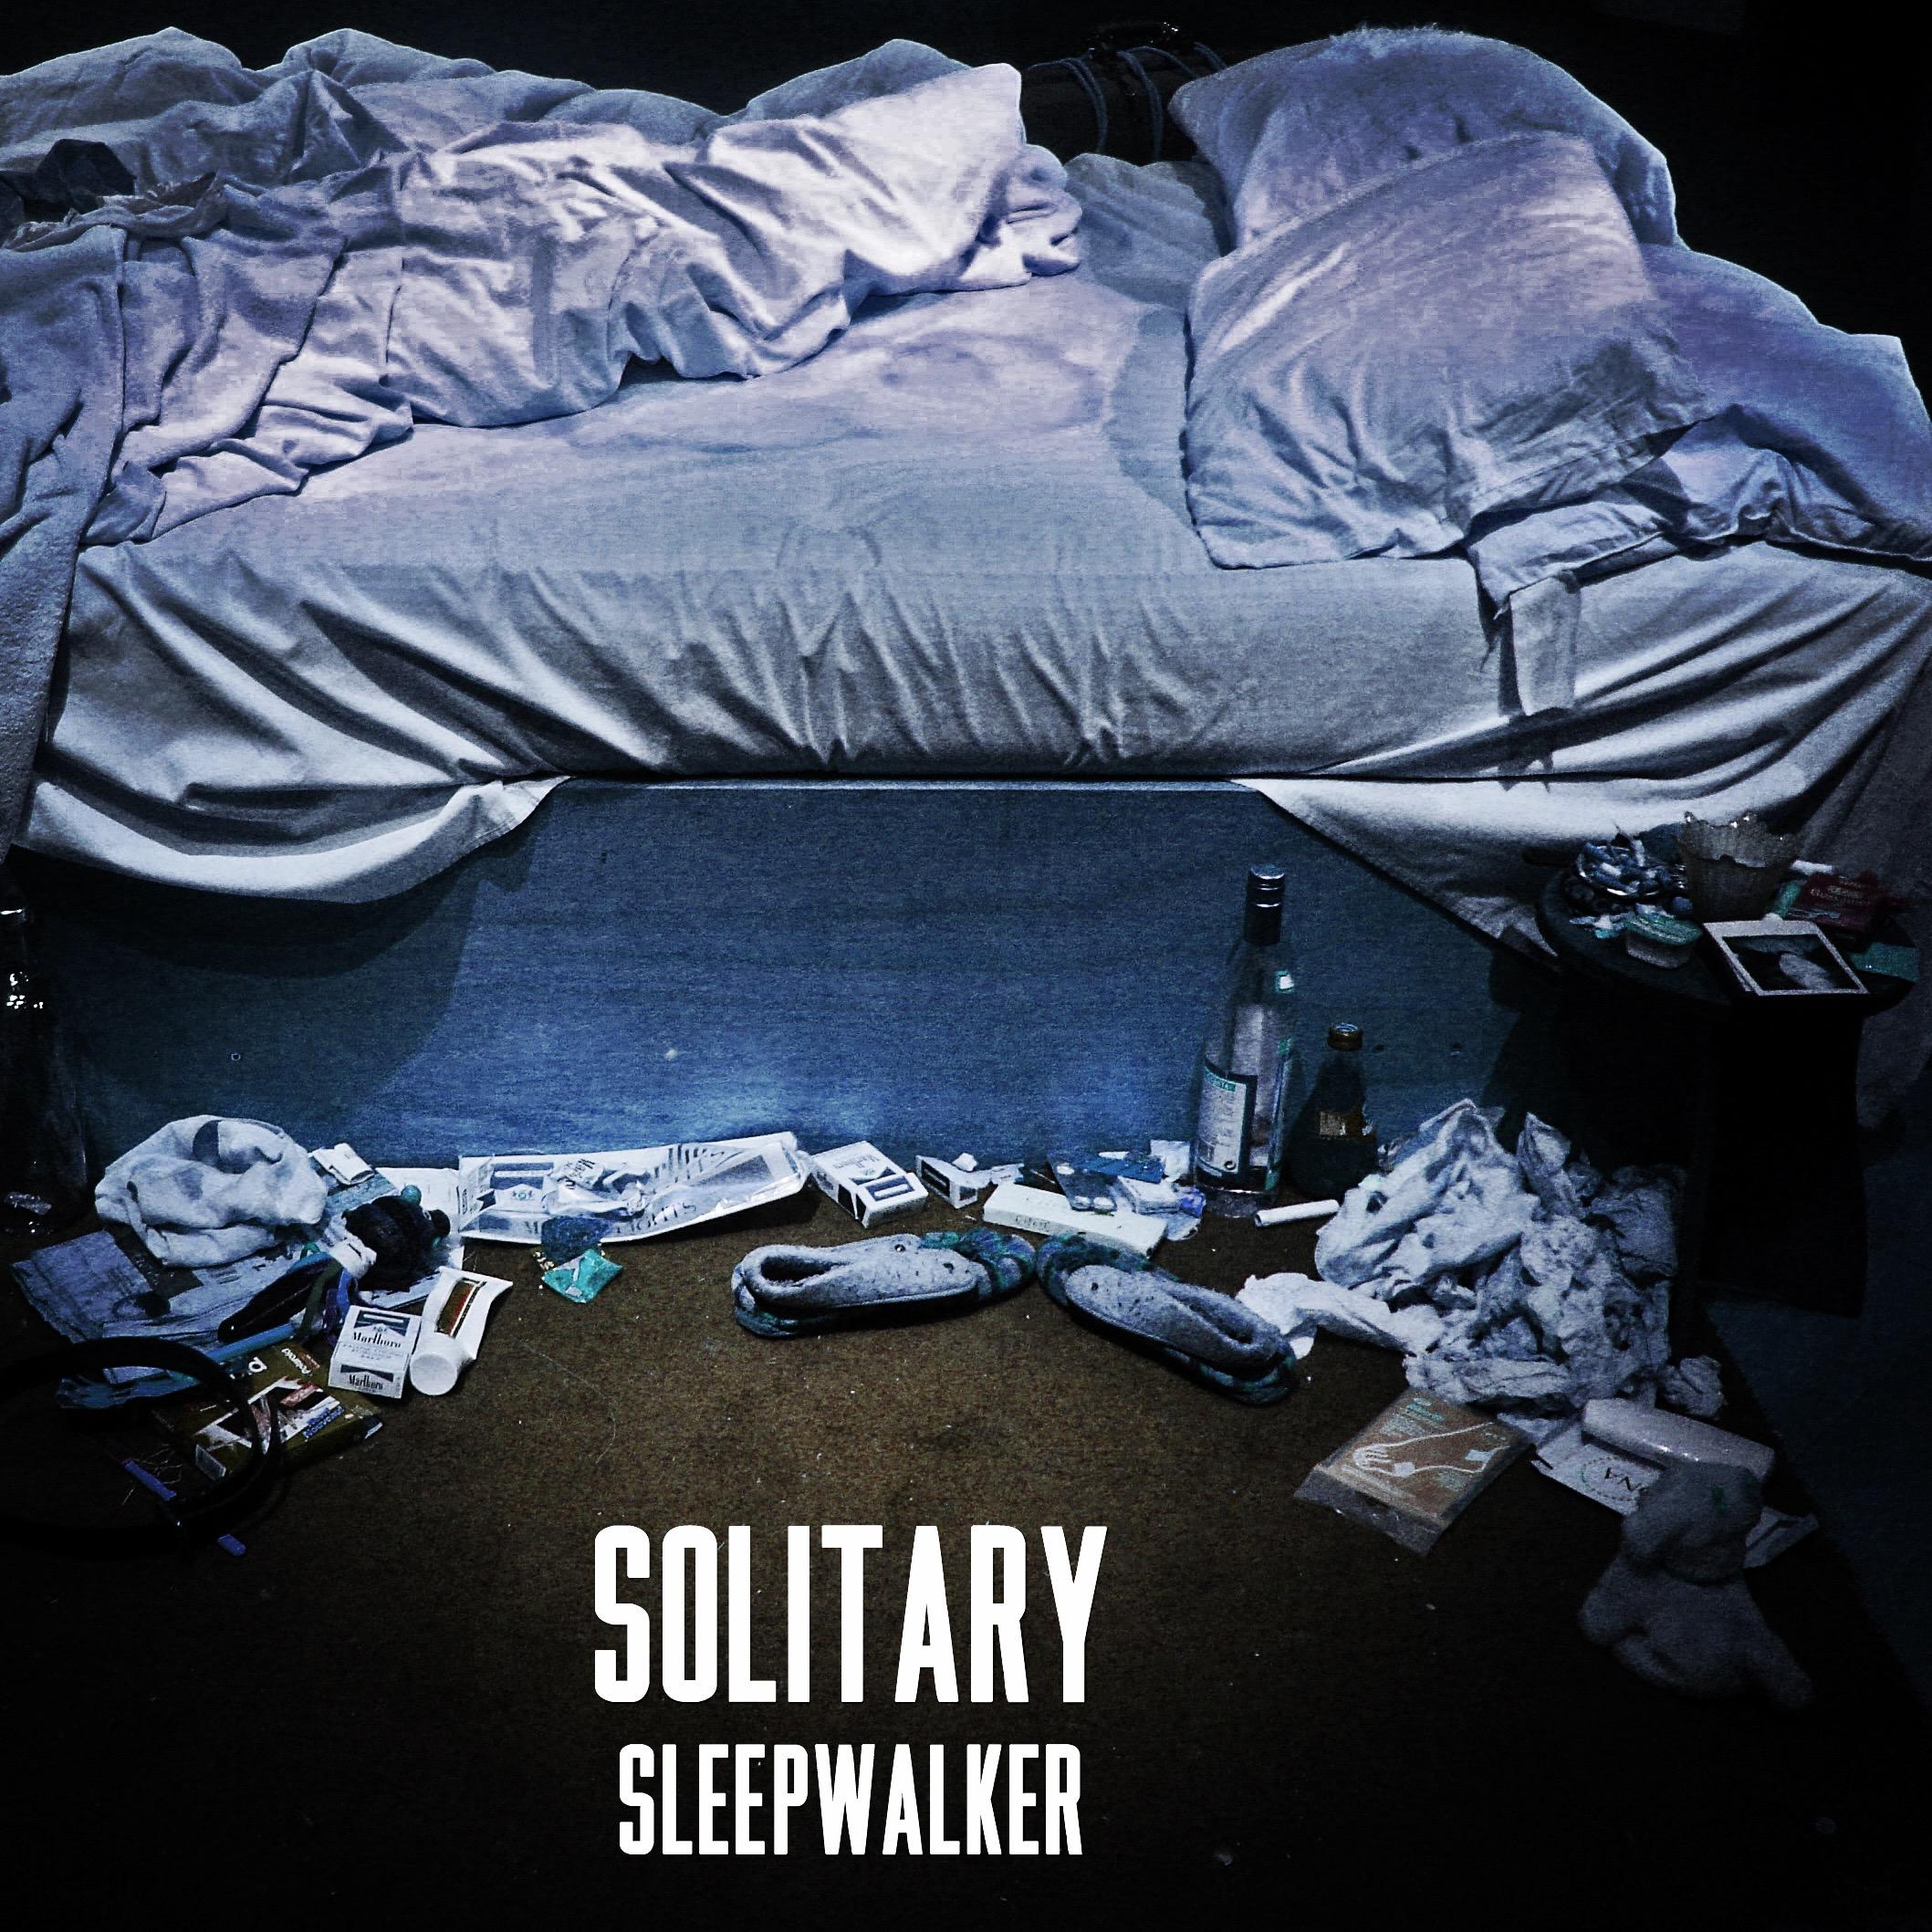 Solitary: Sleepwalker